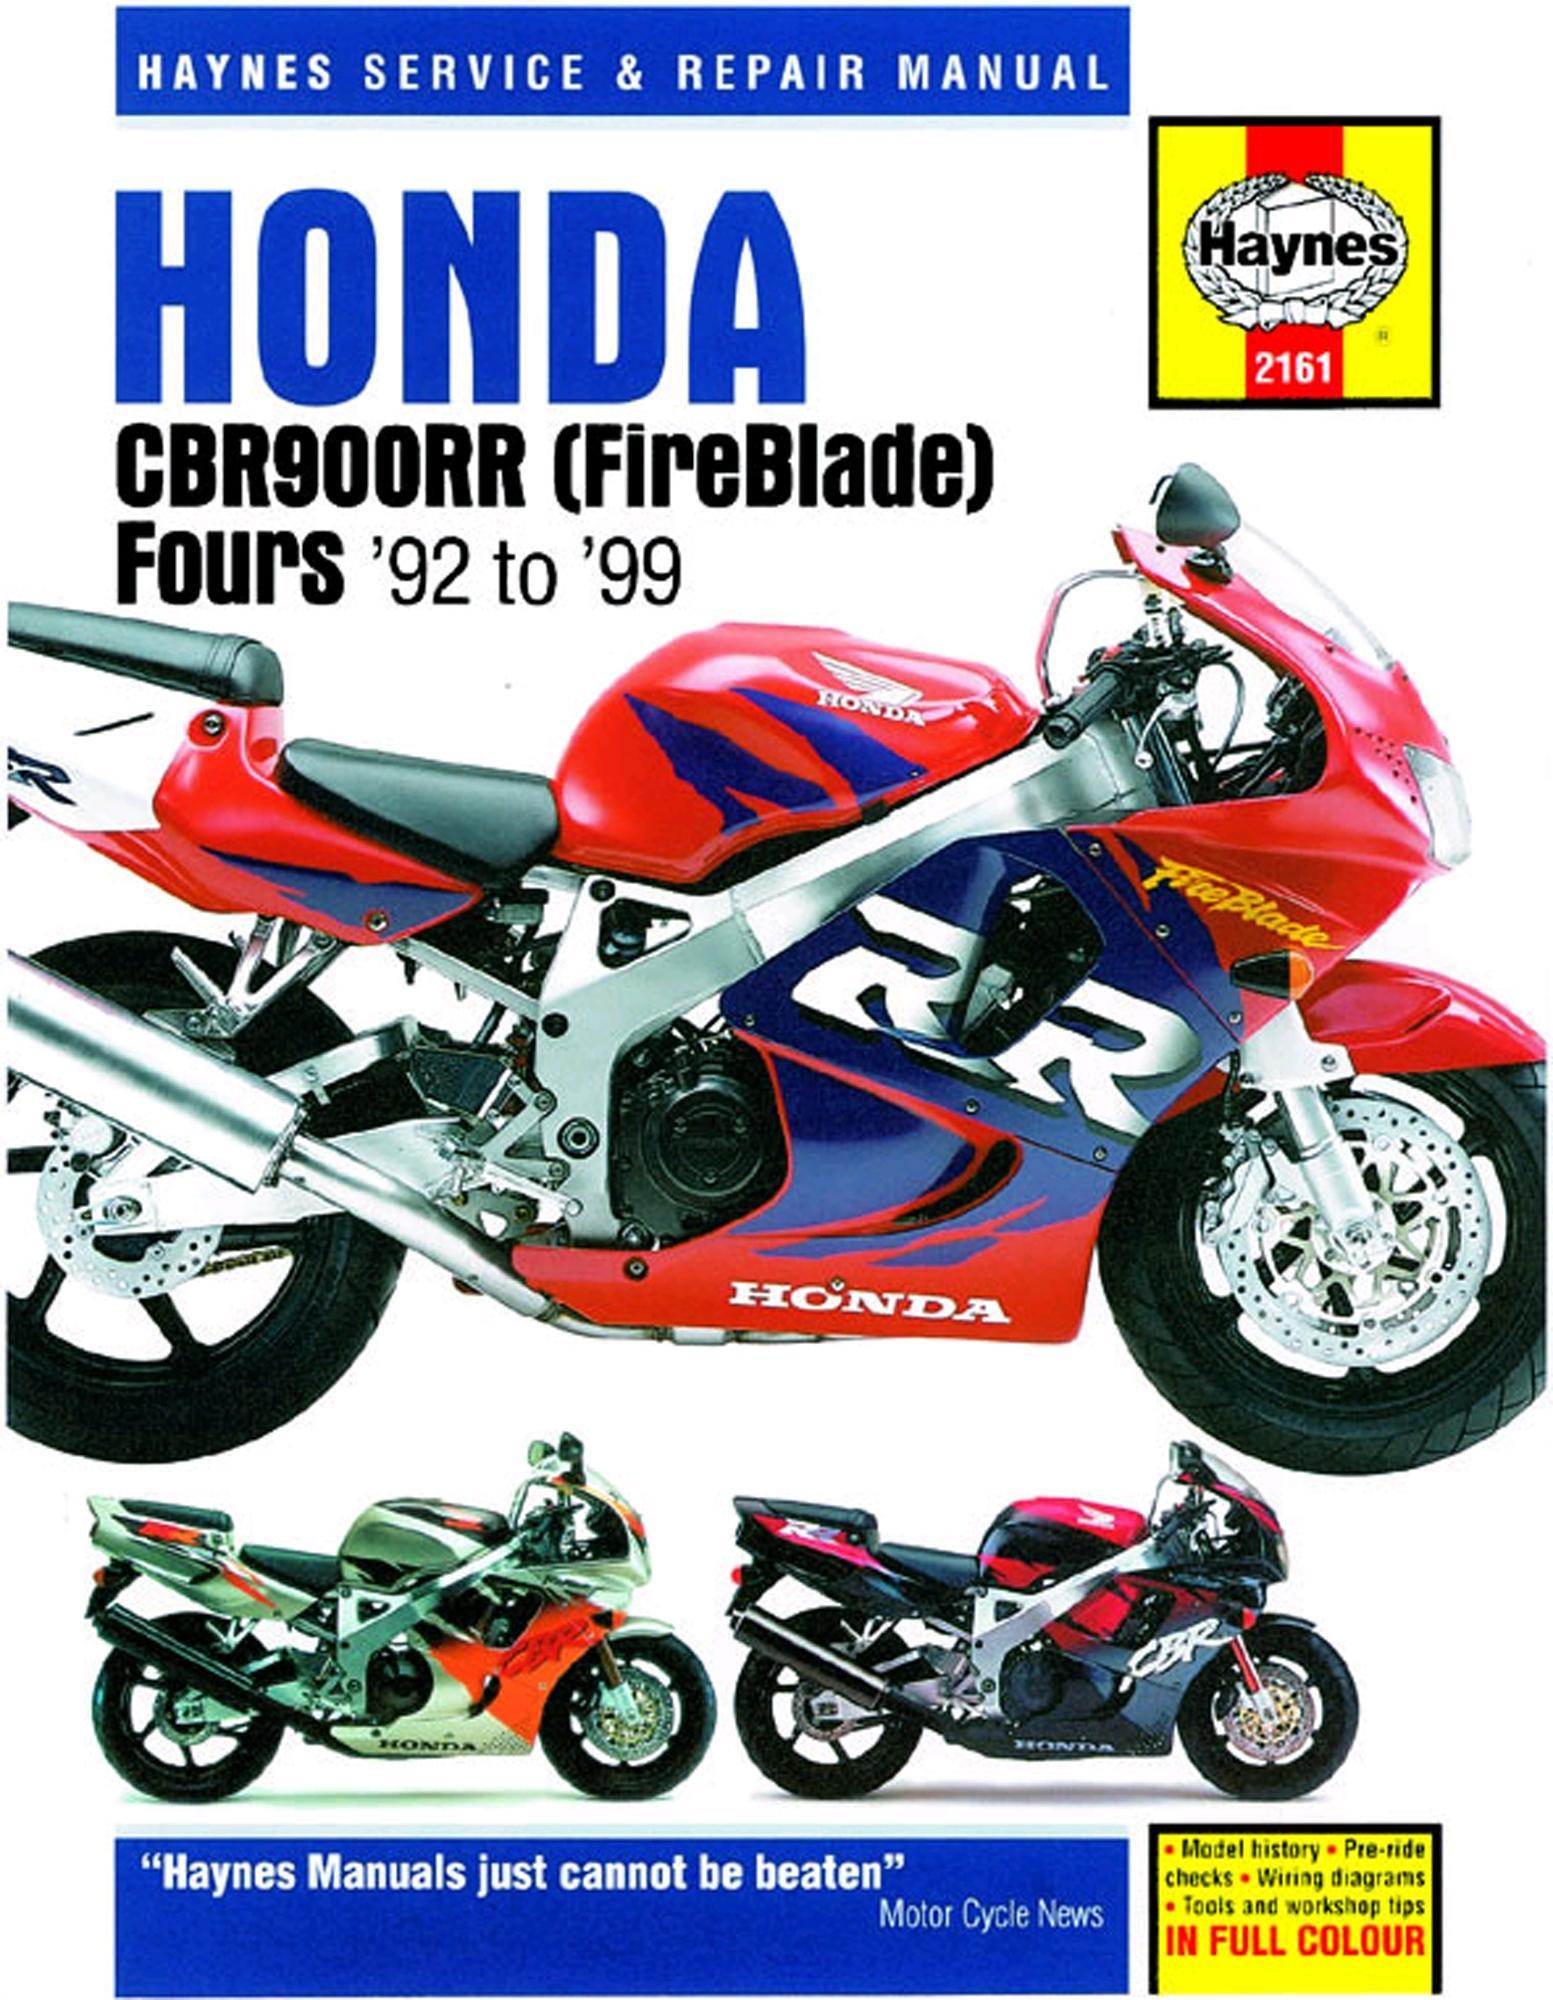 Haynes Service Repair Manual Honda CBR900RR FireBlade Fours 92 - 99  Maintenance